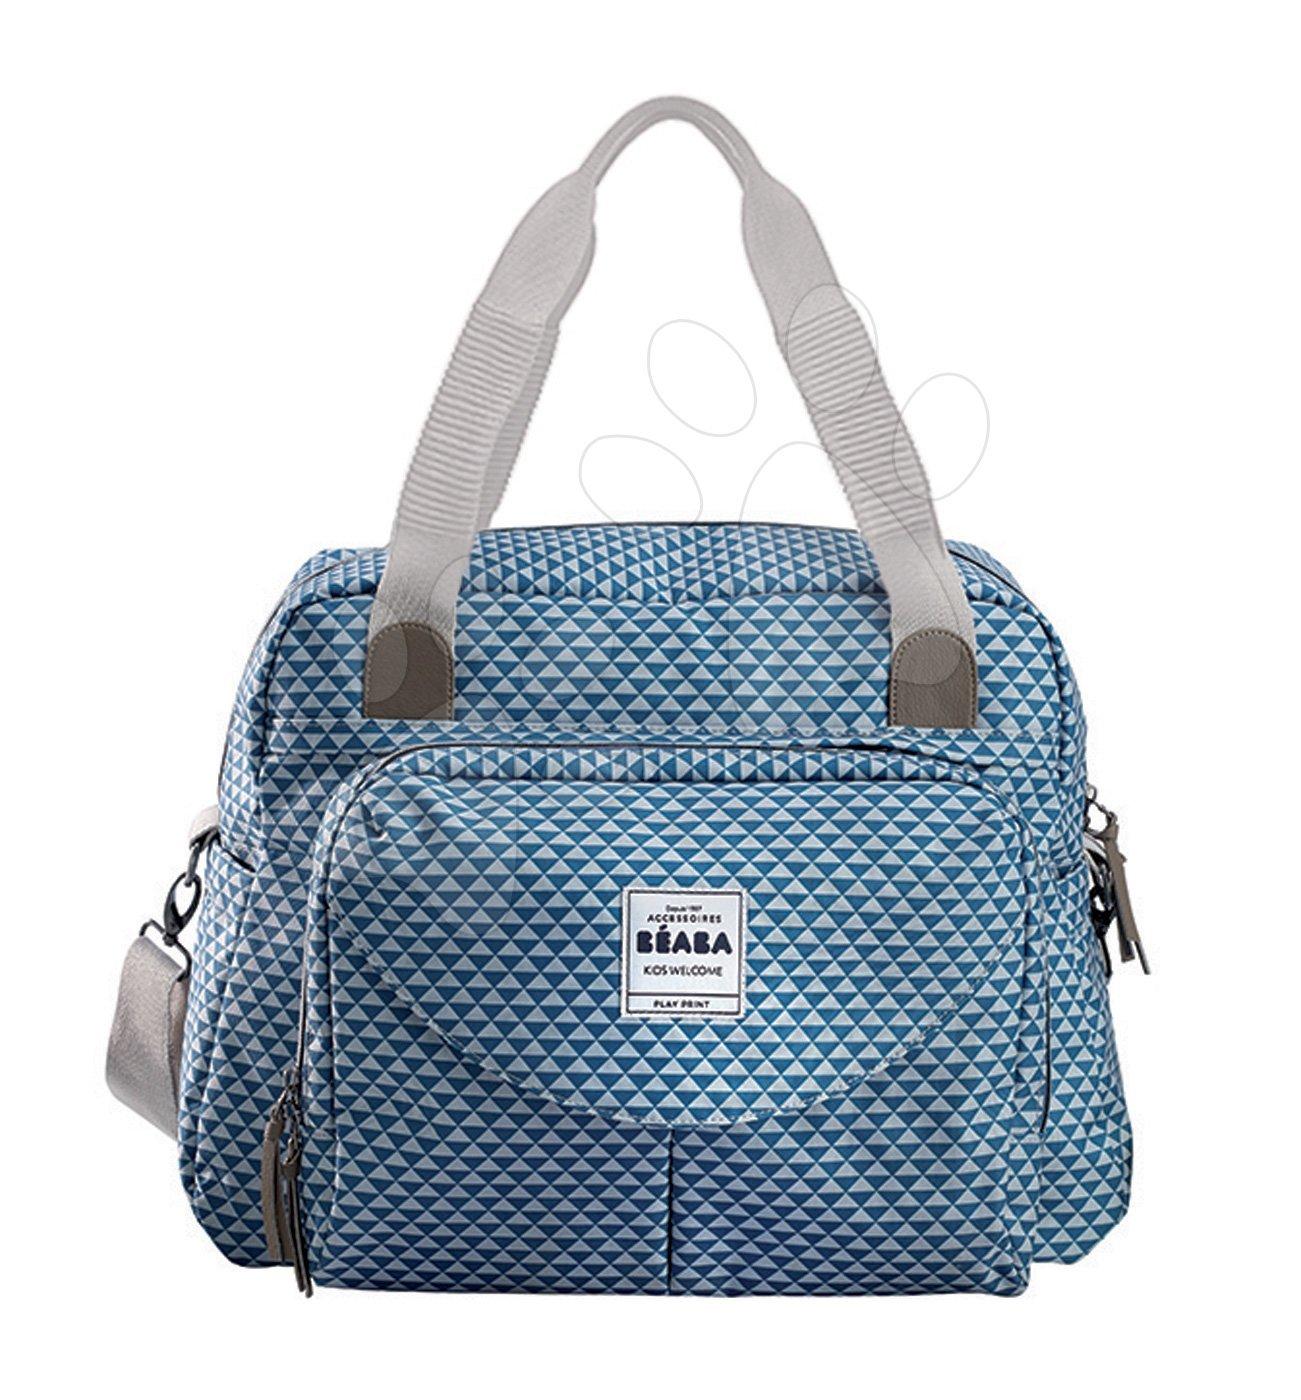 Previjalna torba za vozičke Beaba Geneva II kocke modra